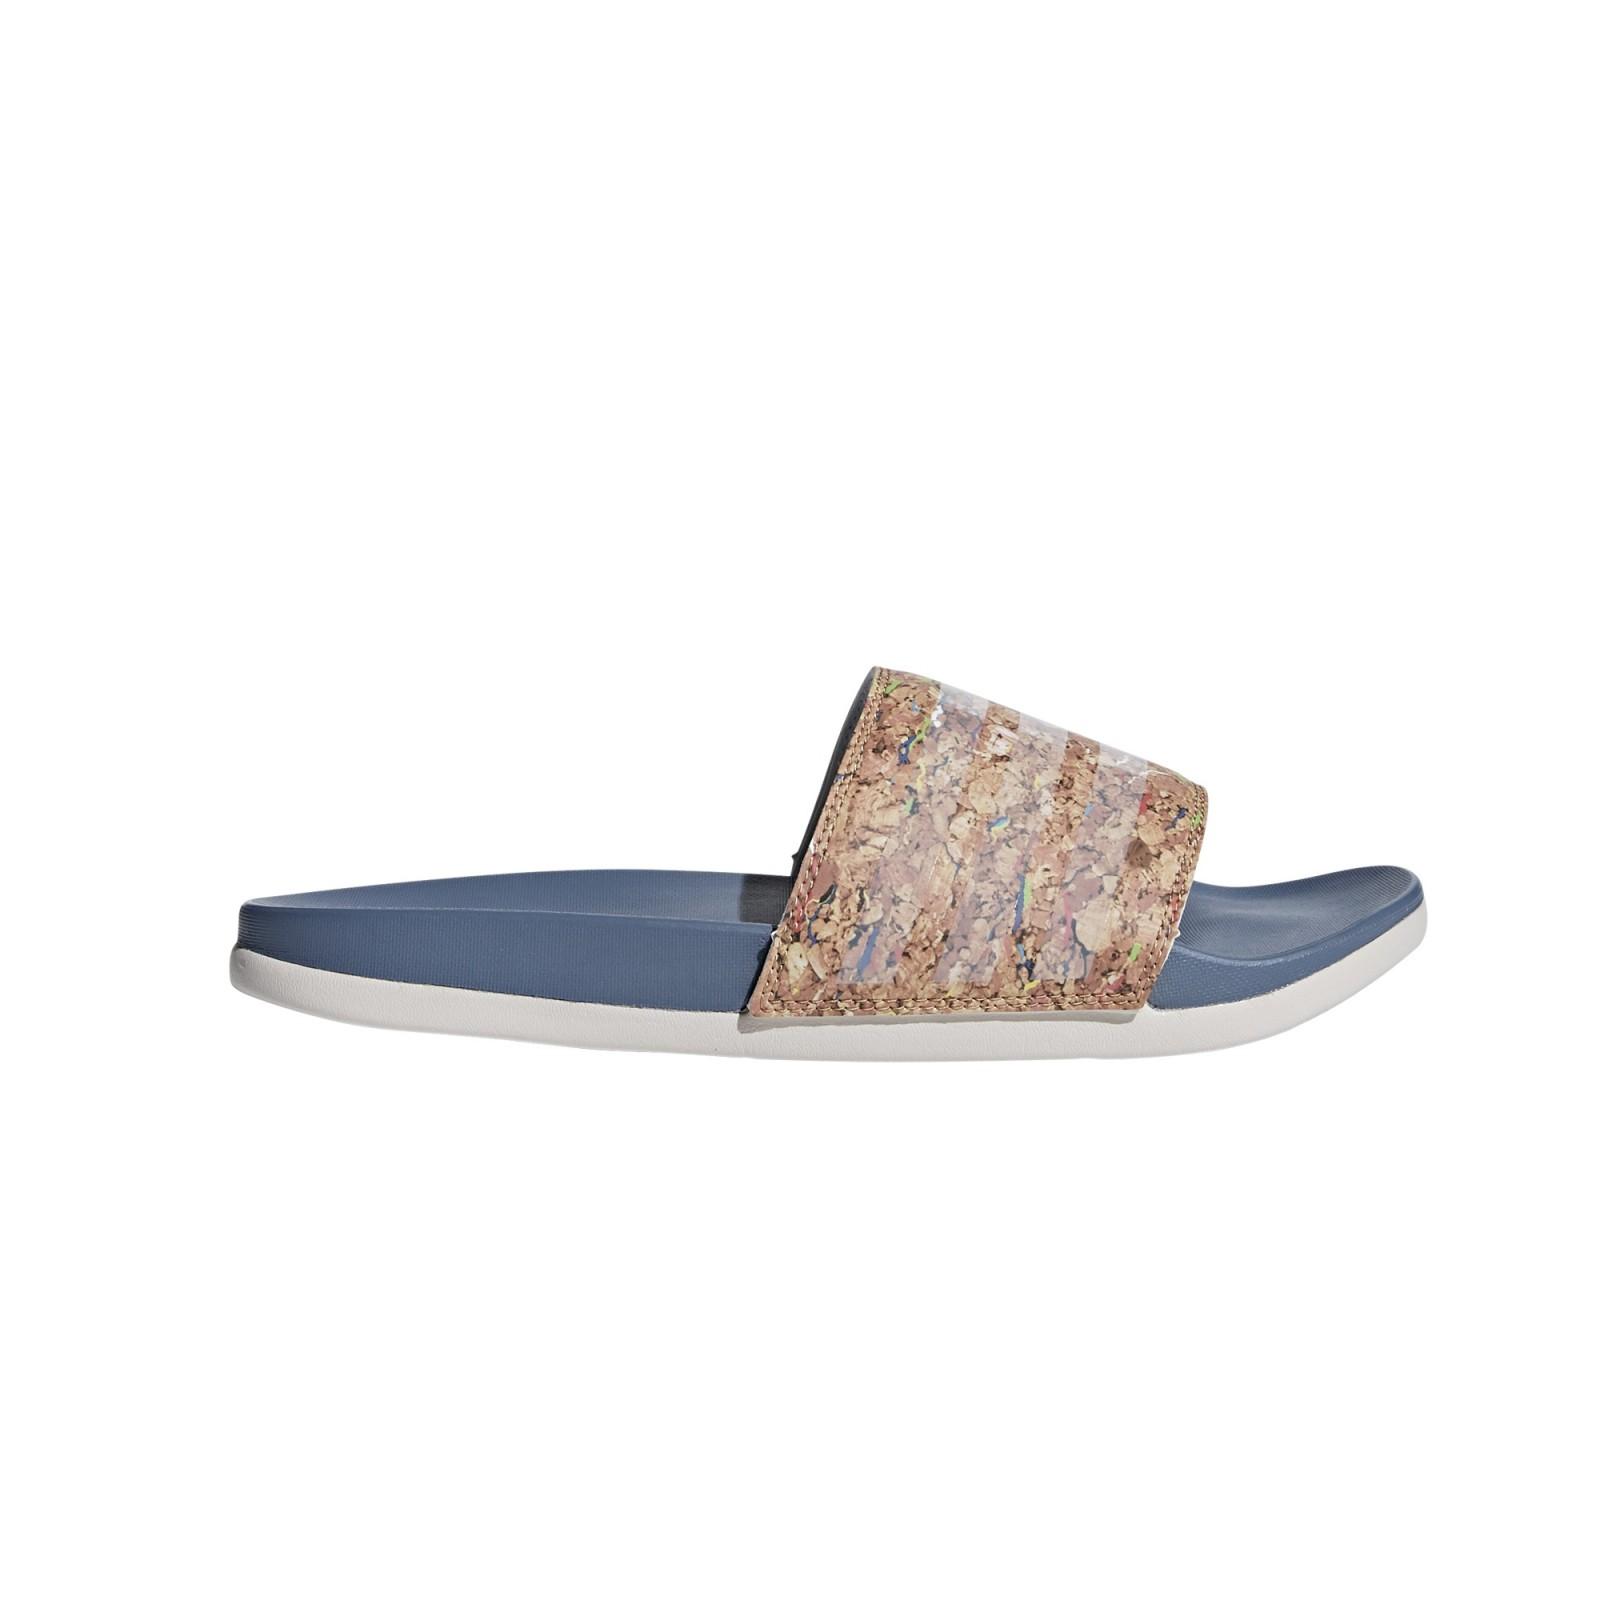 4280766944b Dámské pantofle adidas Performance adilette CF+ cork W